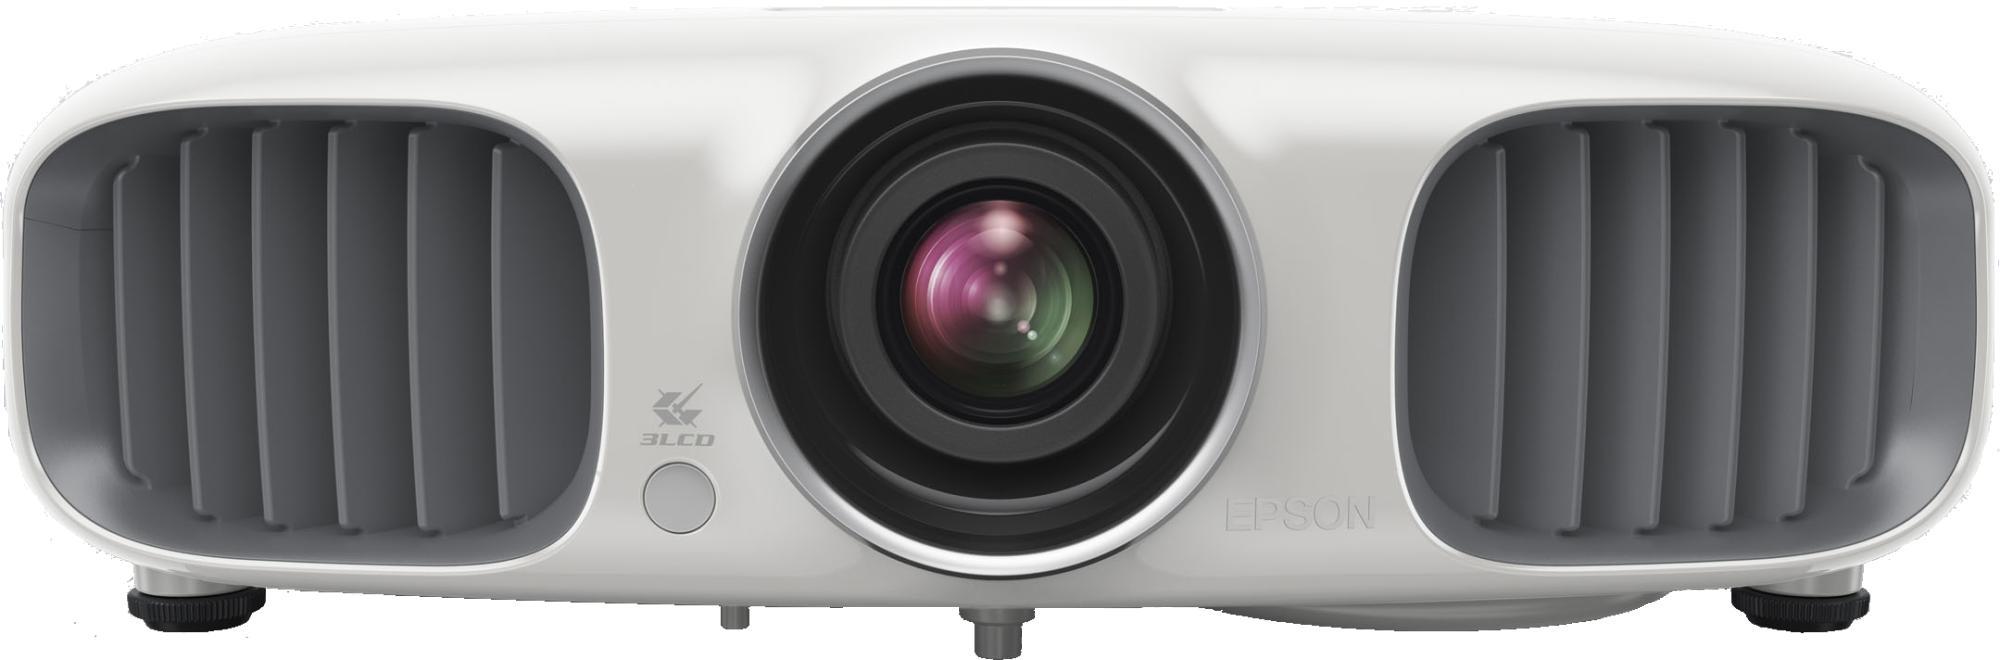 Epson PowerLite Home Cinema 3010